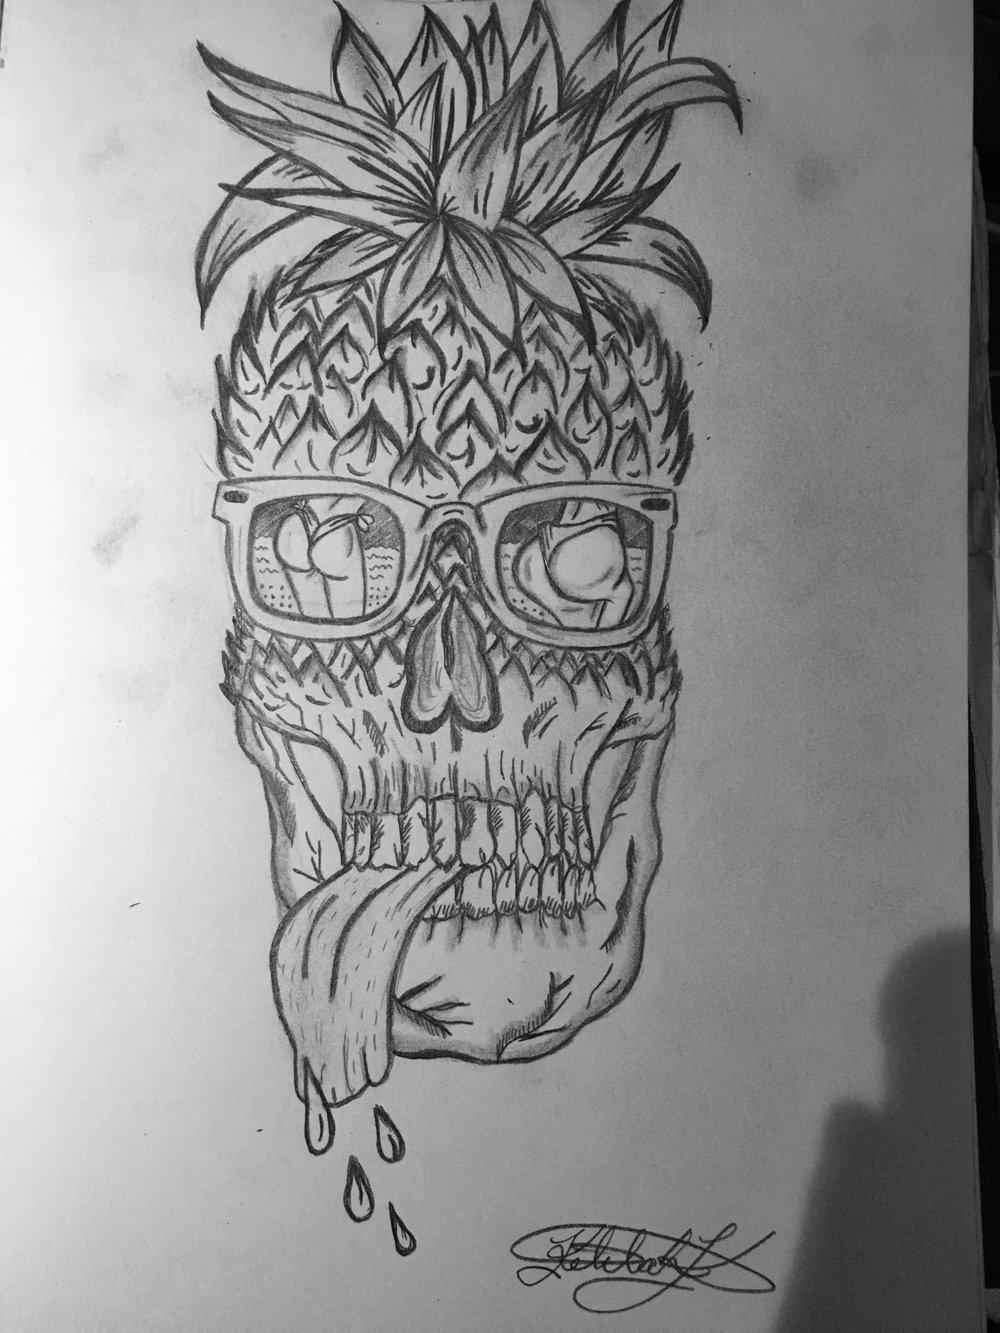 Pineapple A$$